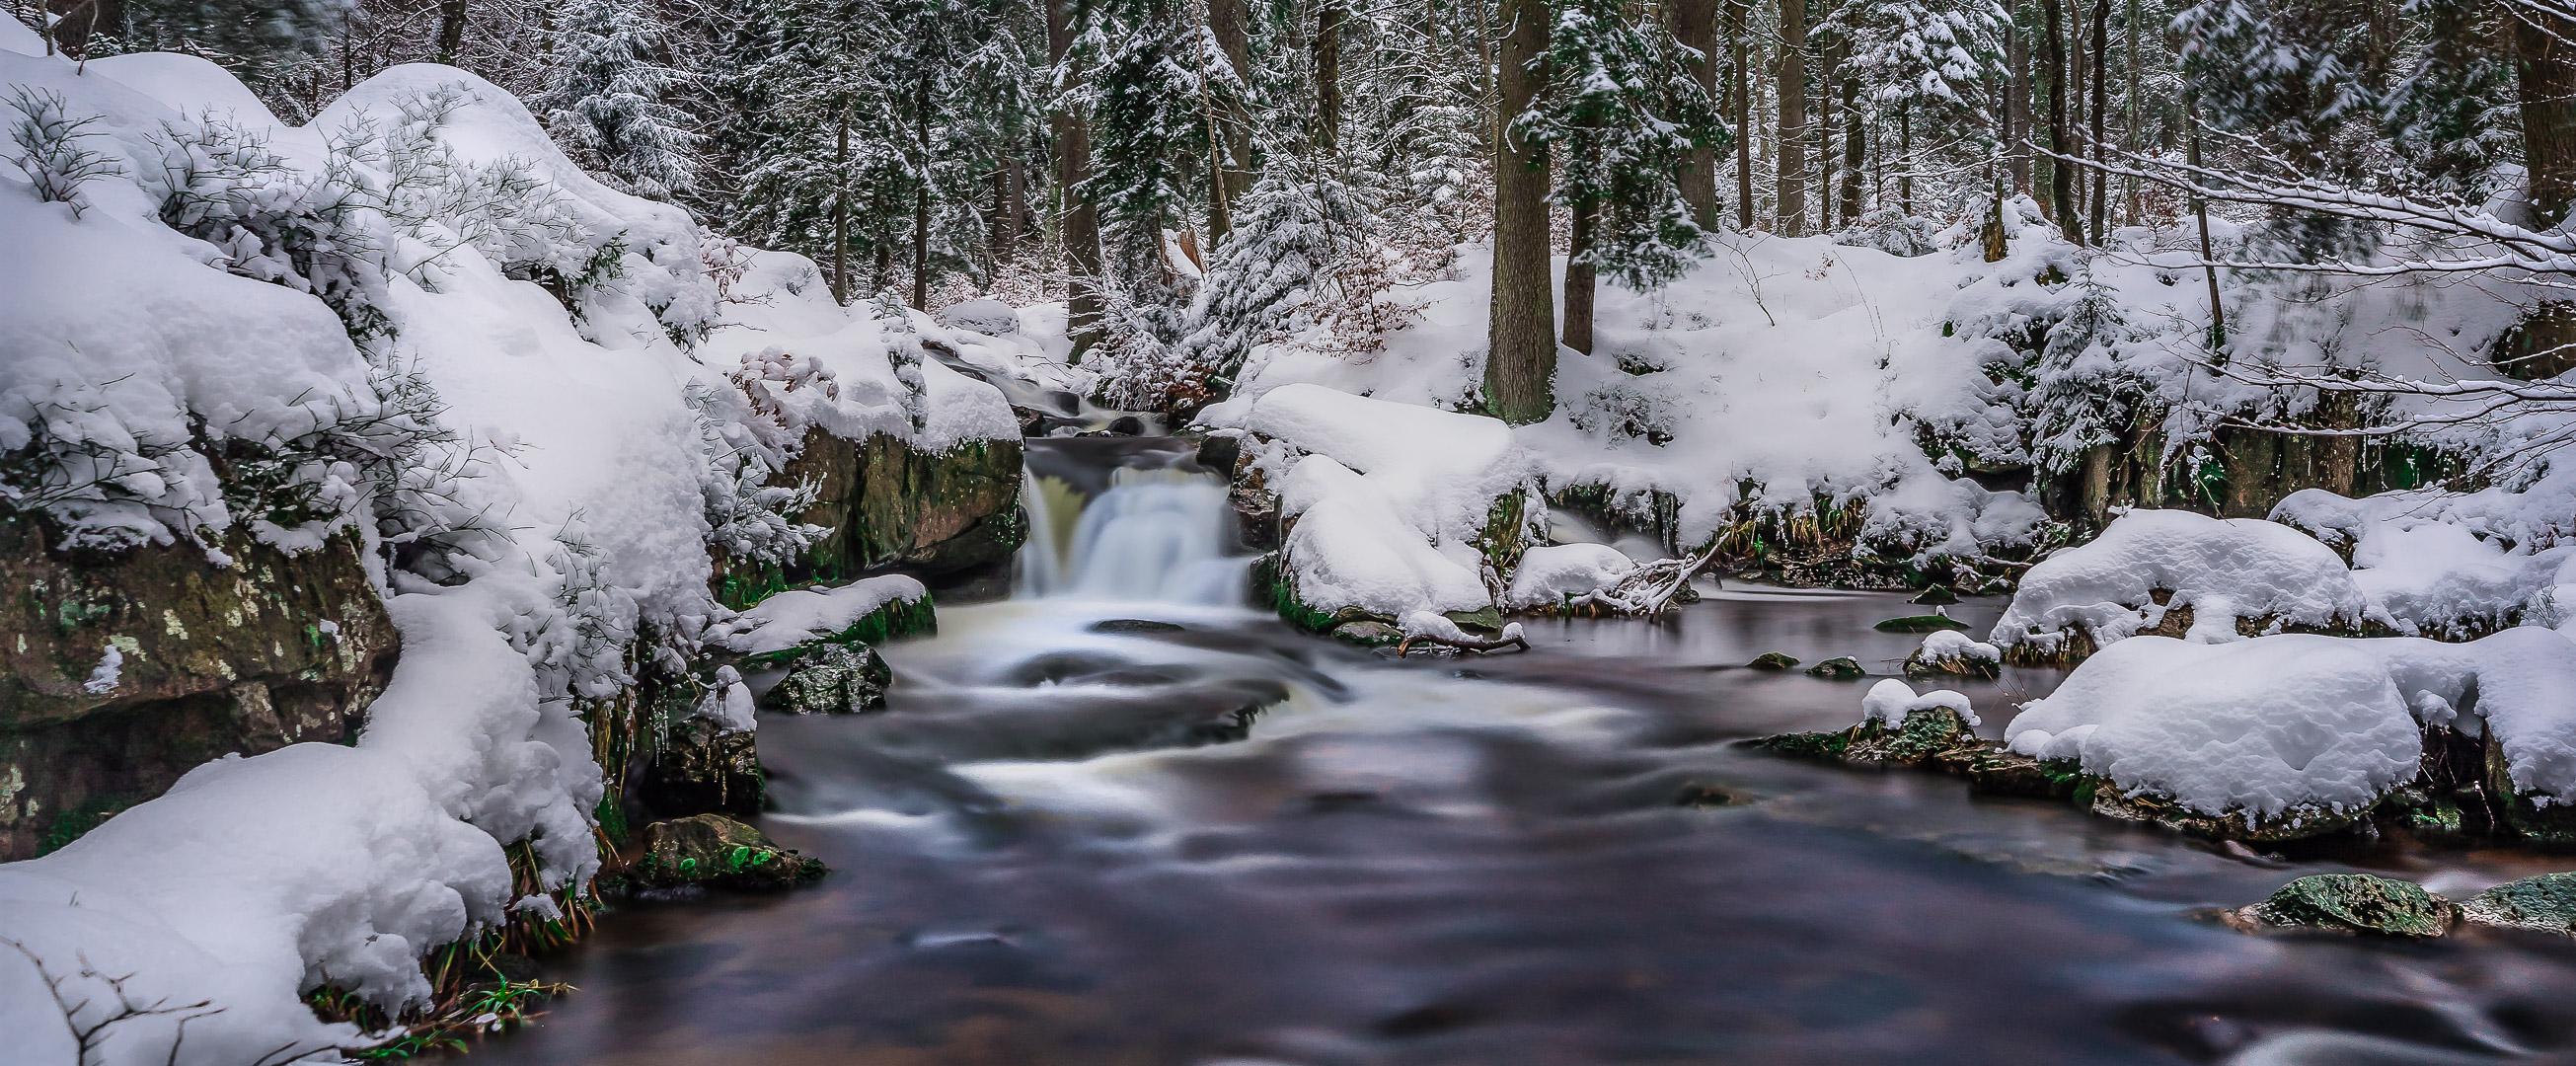 Winterlandschaft / winterscape